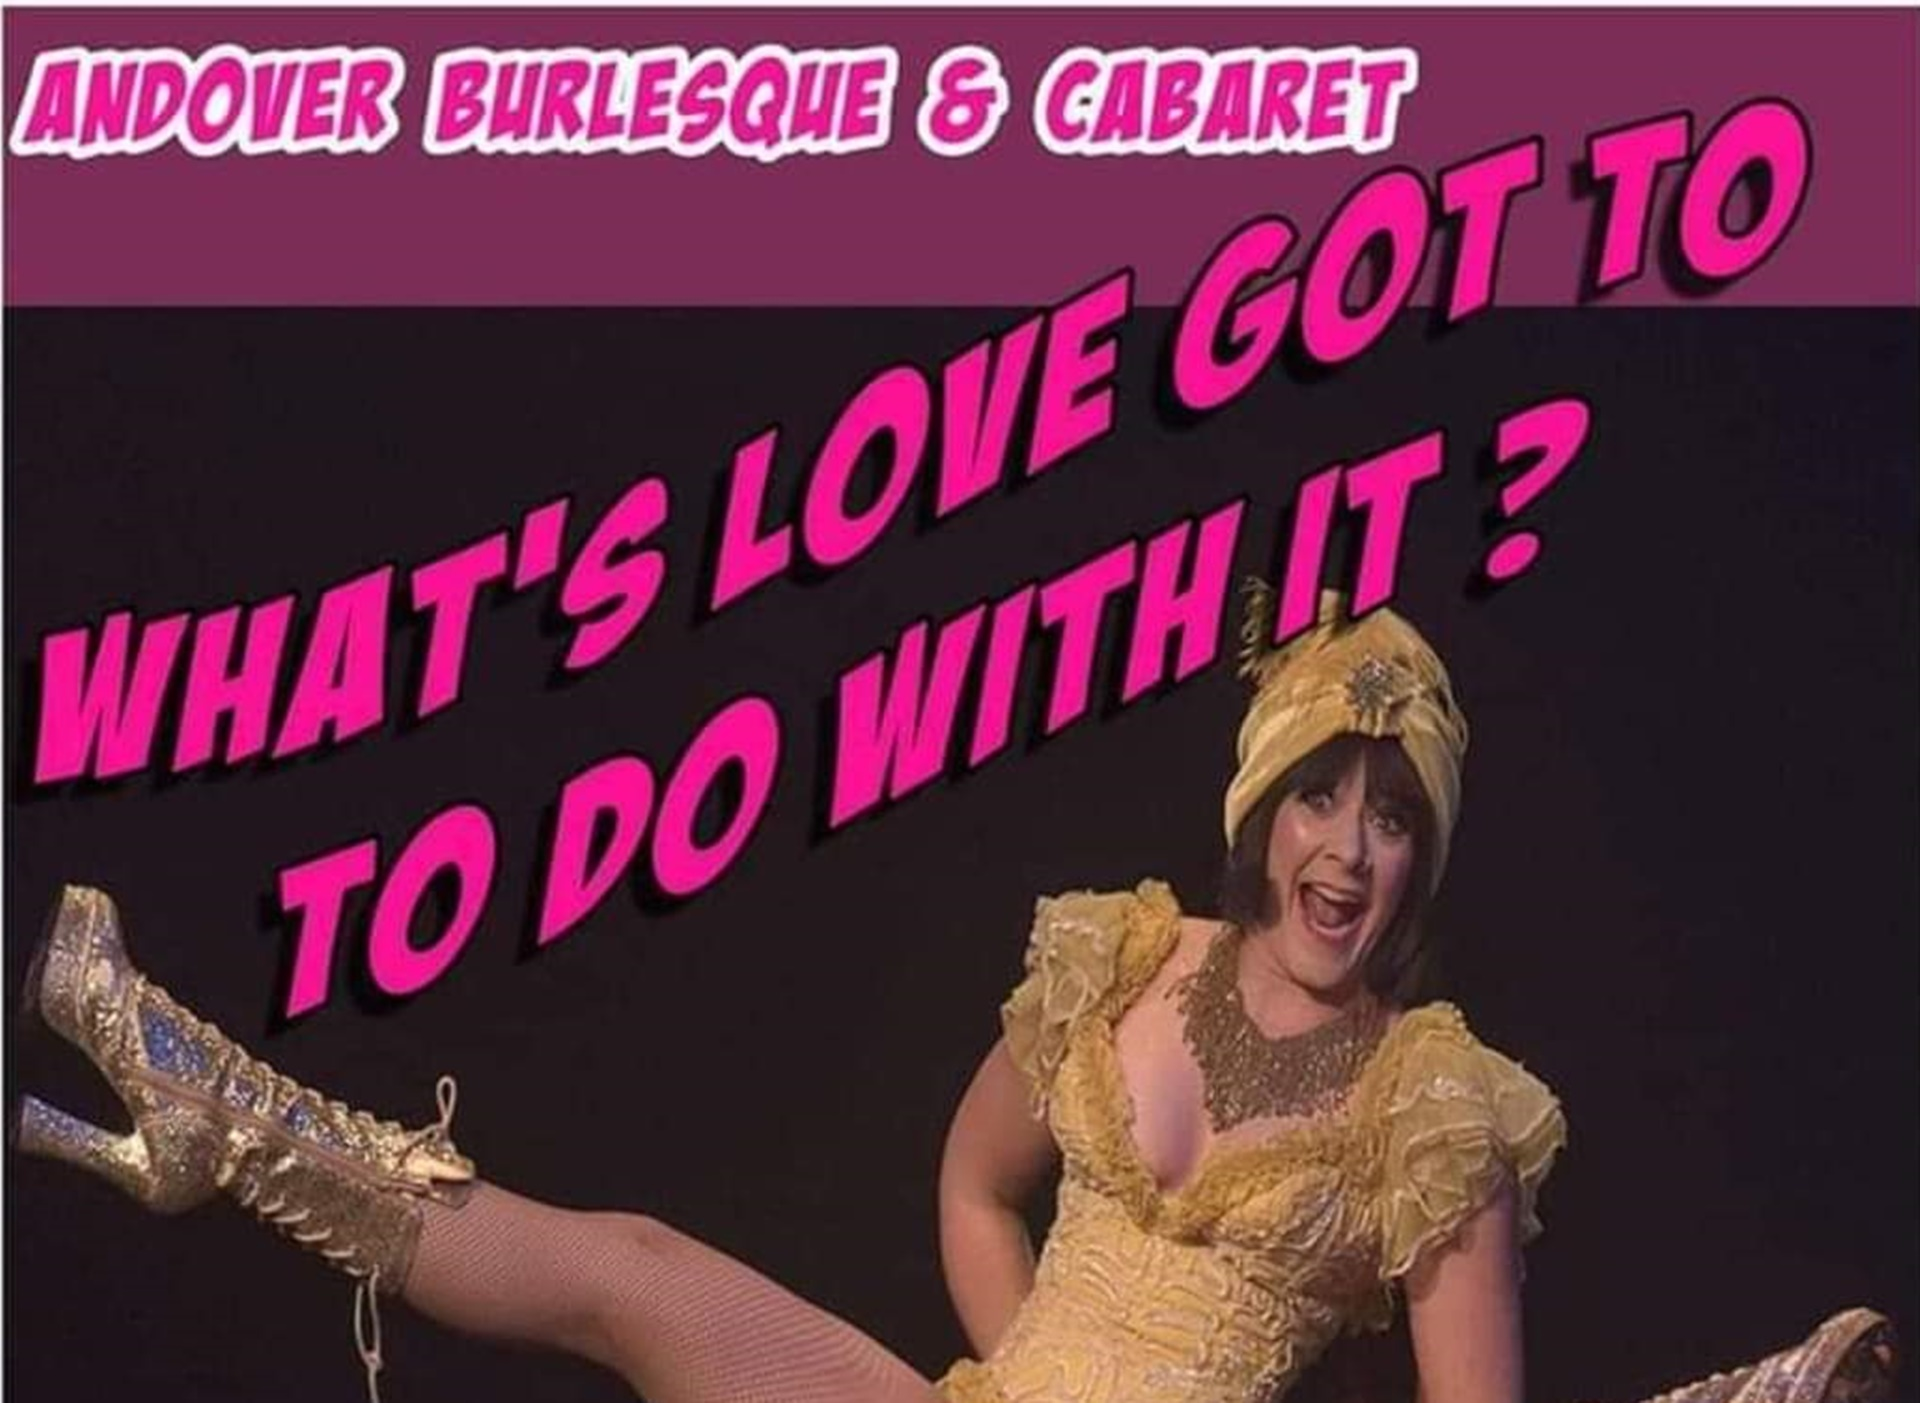 Andover Burlesque & Cabaret